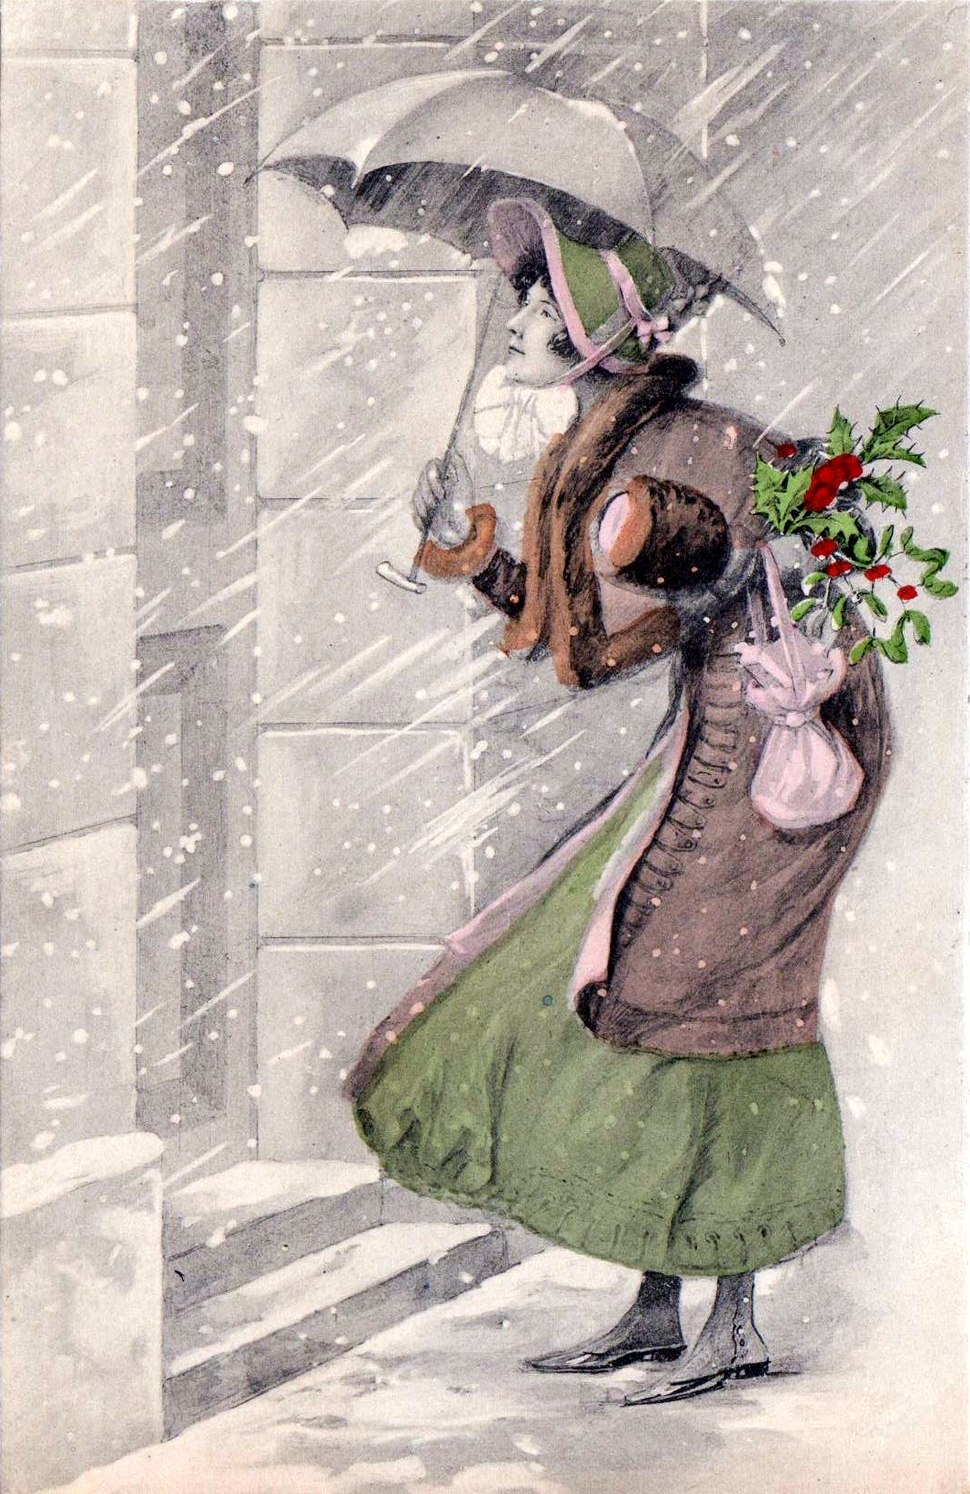 The Christmas Visit. Postcard, c. 1910